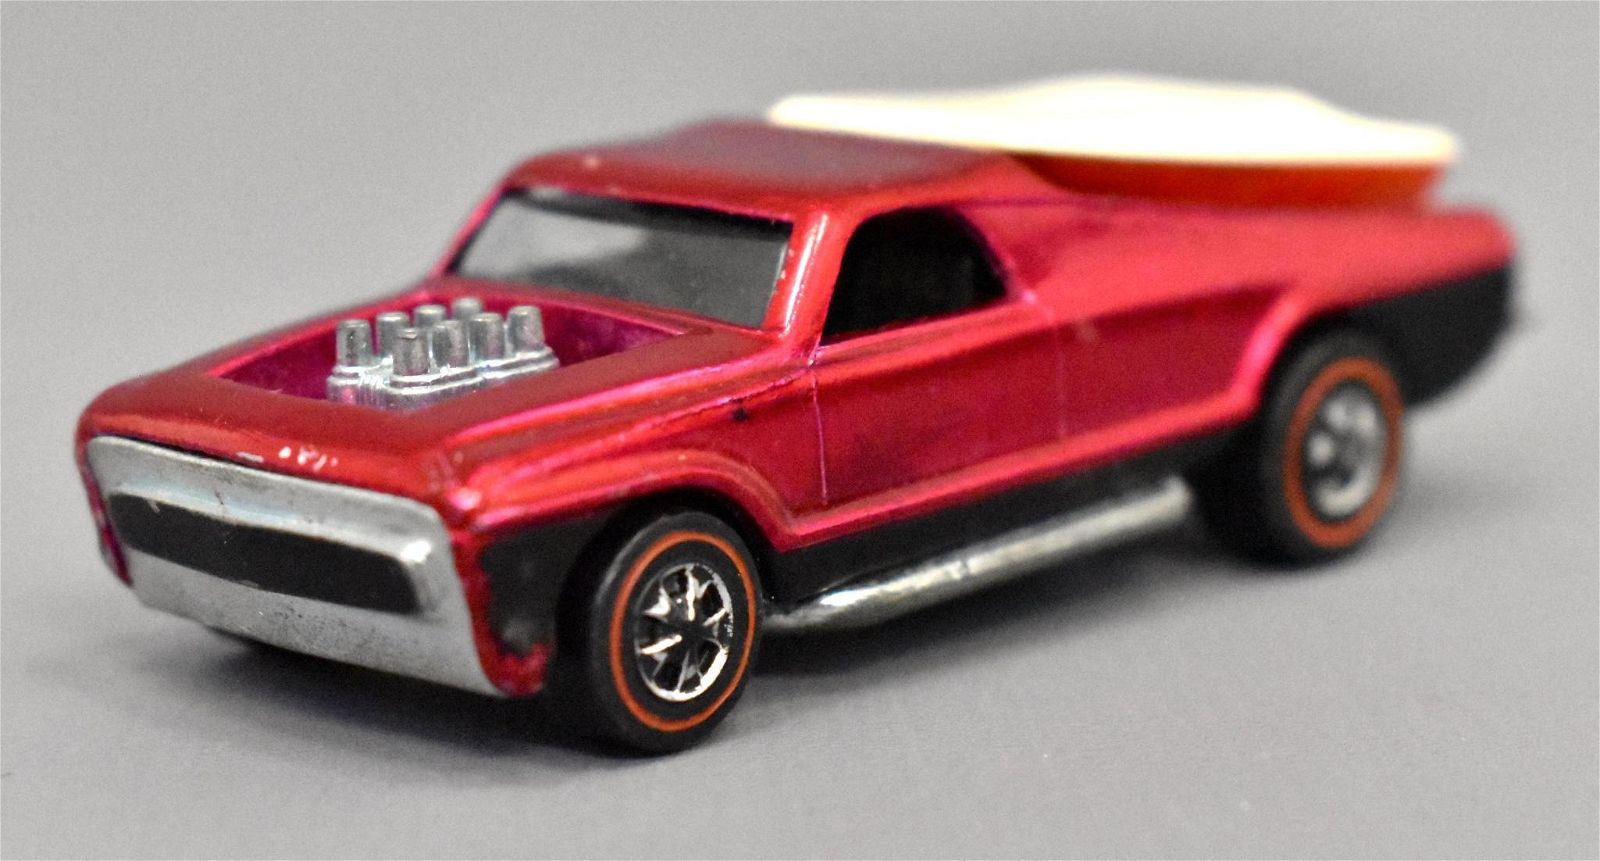 Mattel redline hot wheels Rose Sea Sider